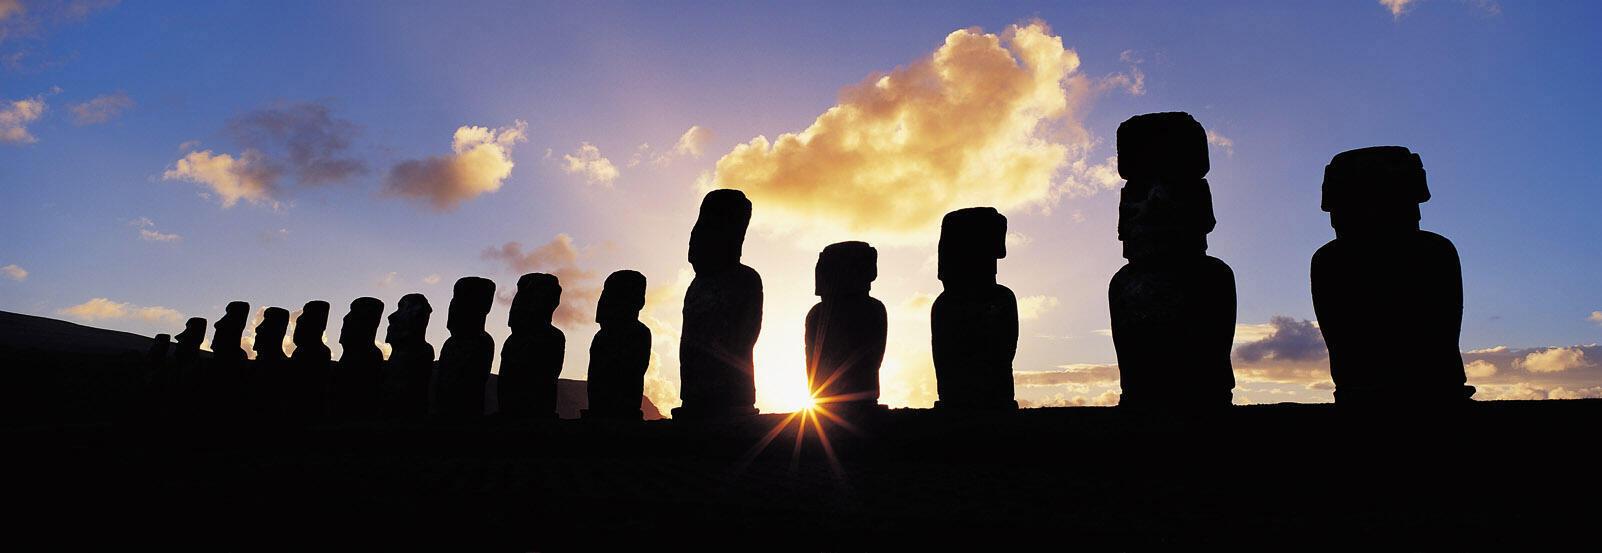 "Estas enormes estatuas, de la cultura ancestral de la etnia rapanui, son conocidas como ""moai""."